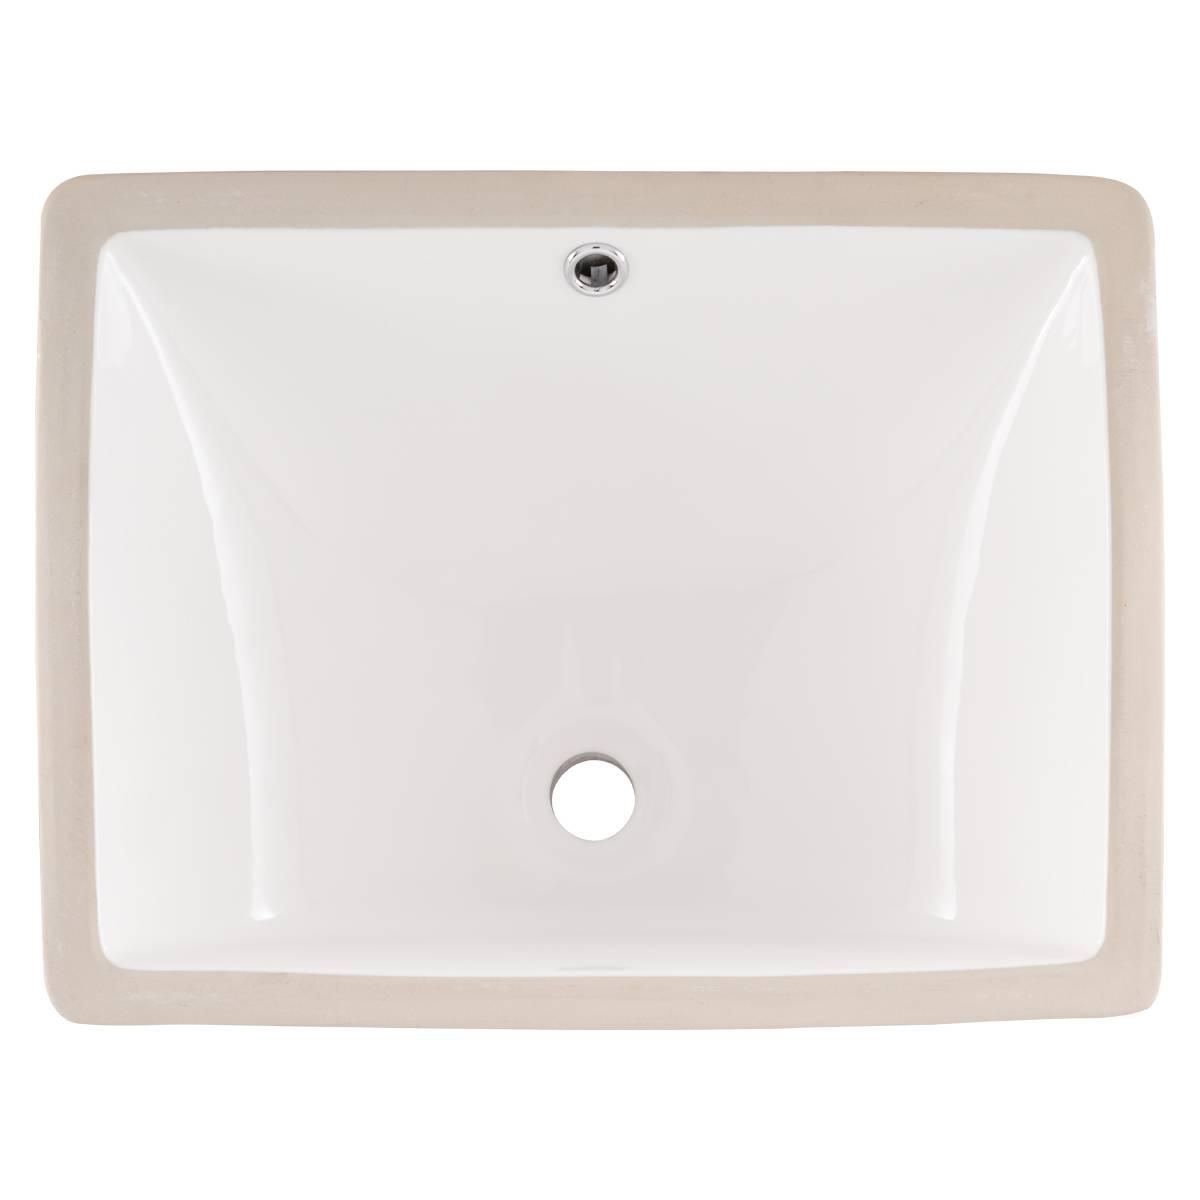 Vanity White Rectangle Ceramic